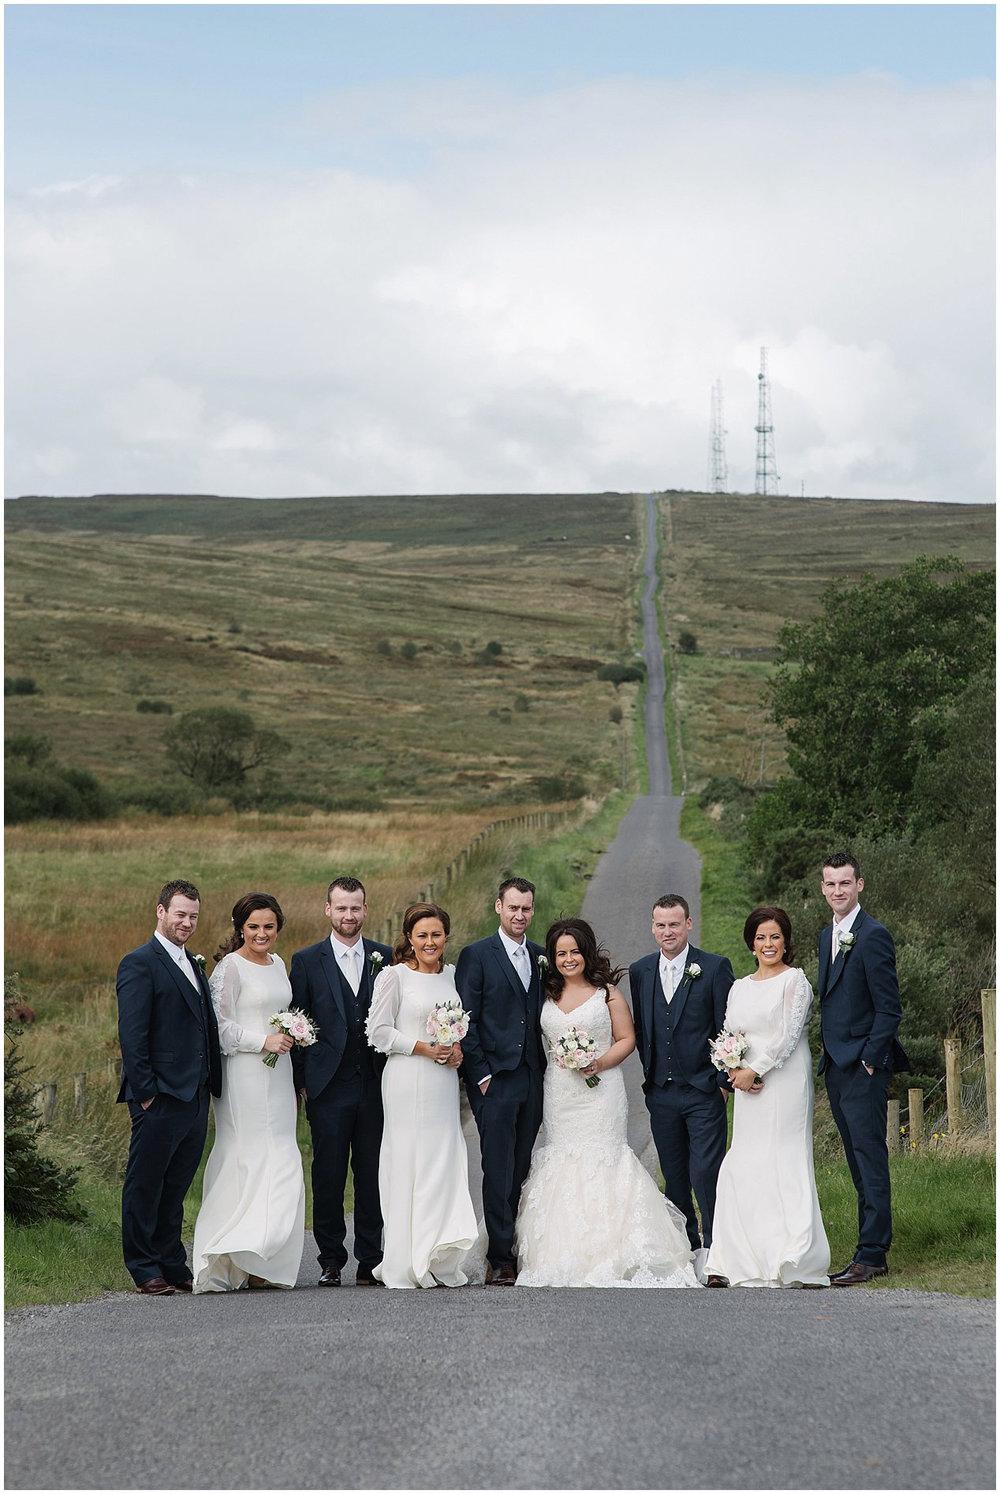 Shauneen_PJ_Hillgrove_Hotel_Monaghan_Wedding_jude_browne_photography_0050.jpg